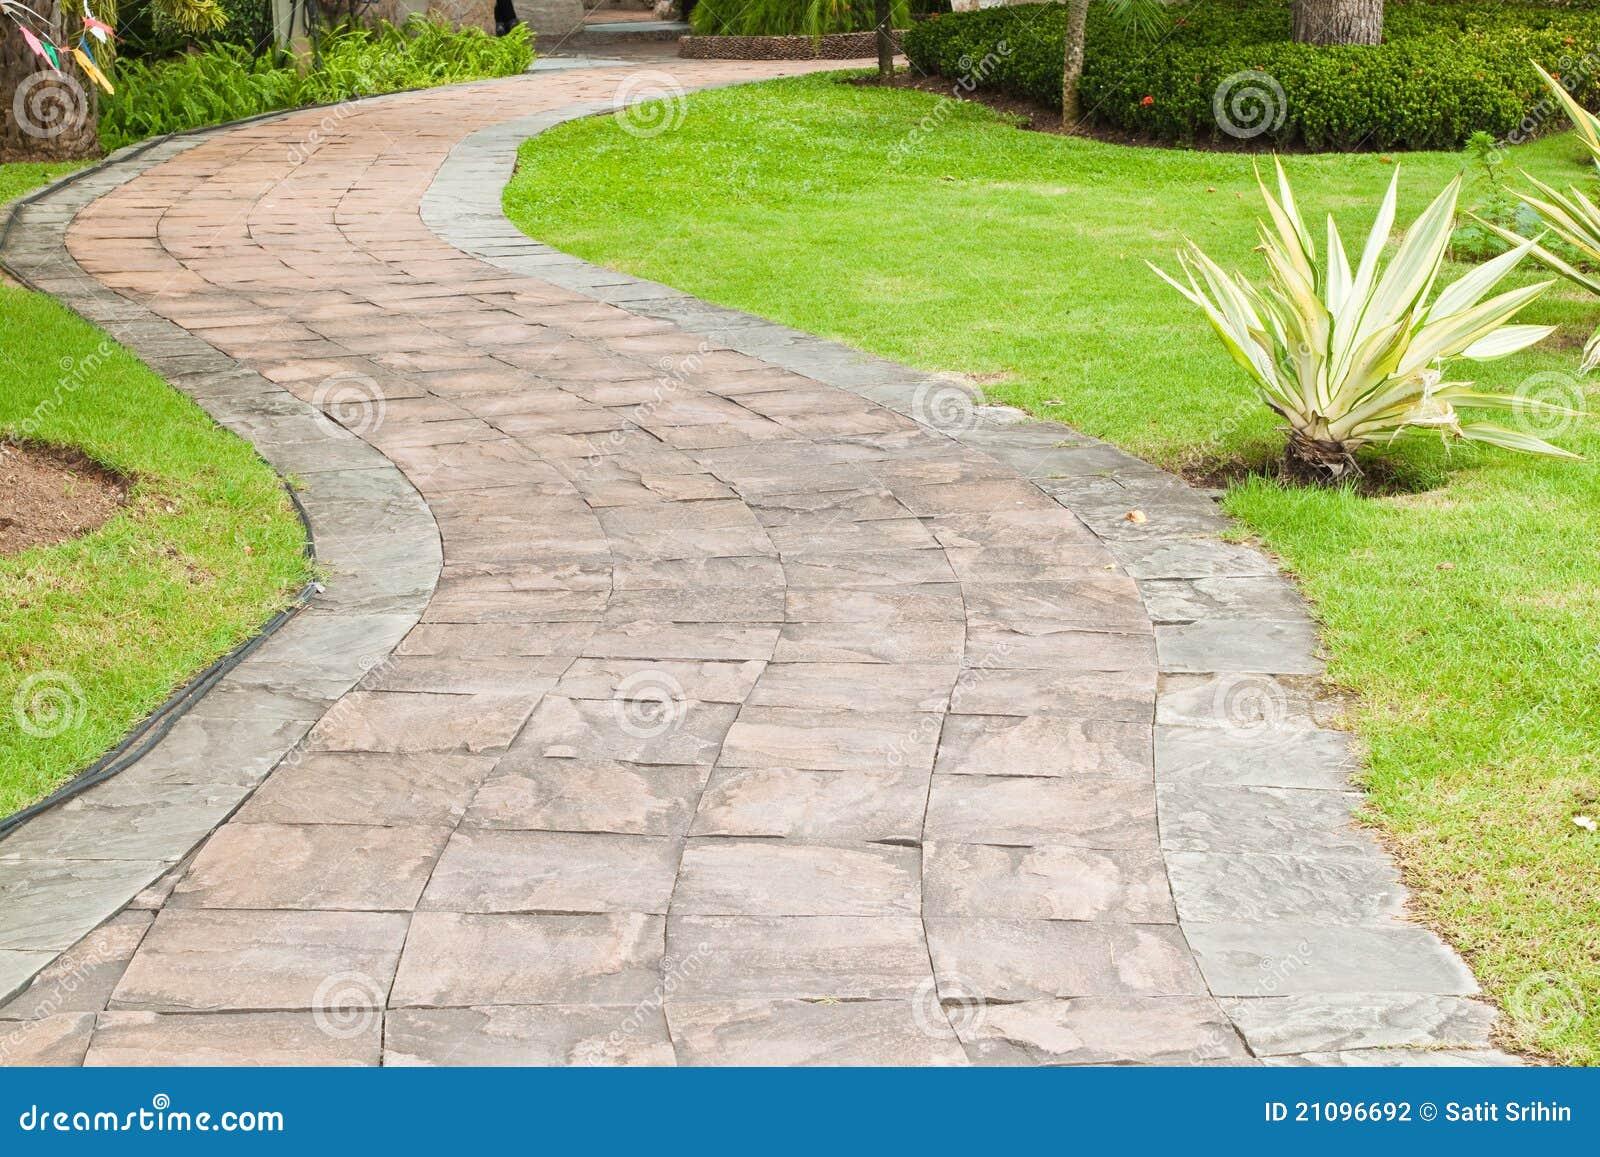 pedra jardim caminho:Stone Pathway Photography